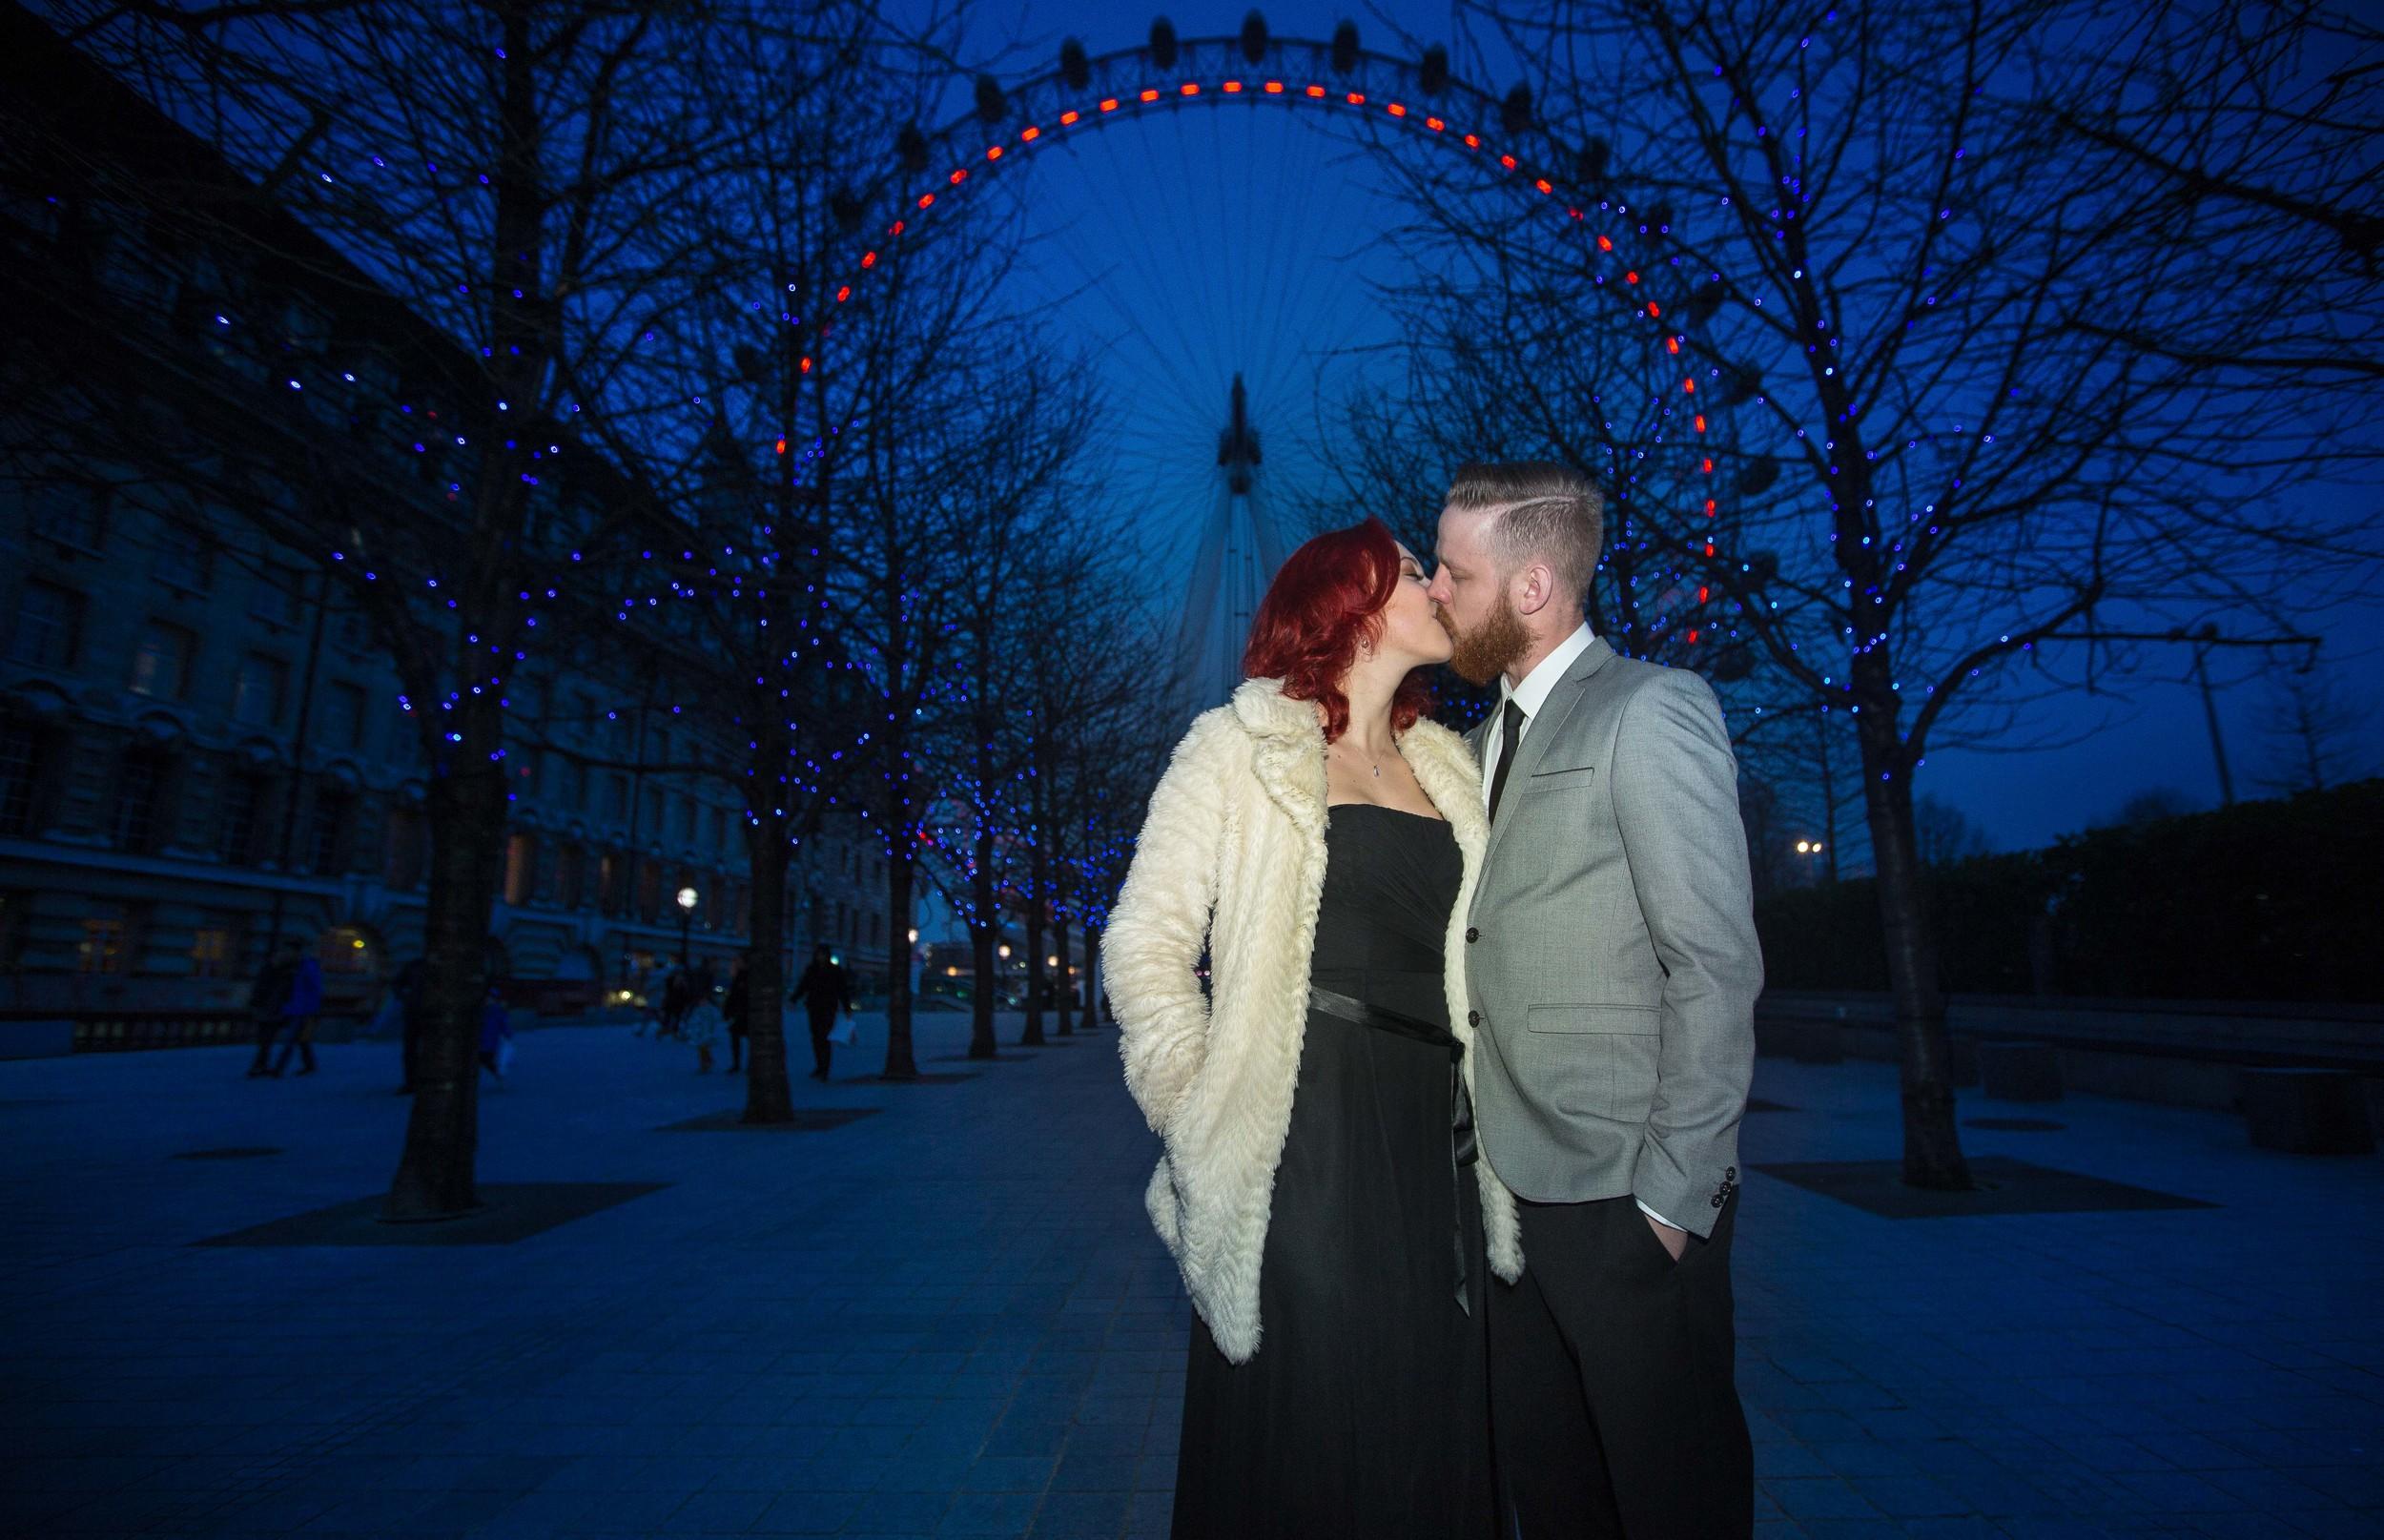 london-eye-engagement-1-london-uk-destination-wedding-photography-Adam-Rowley